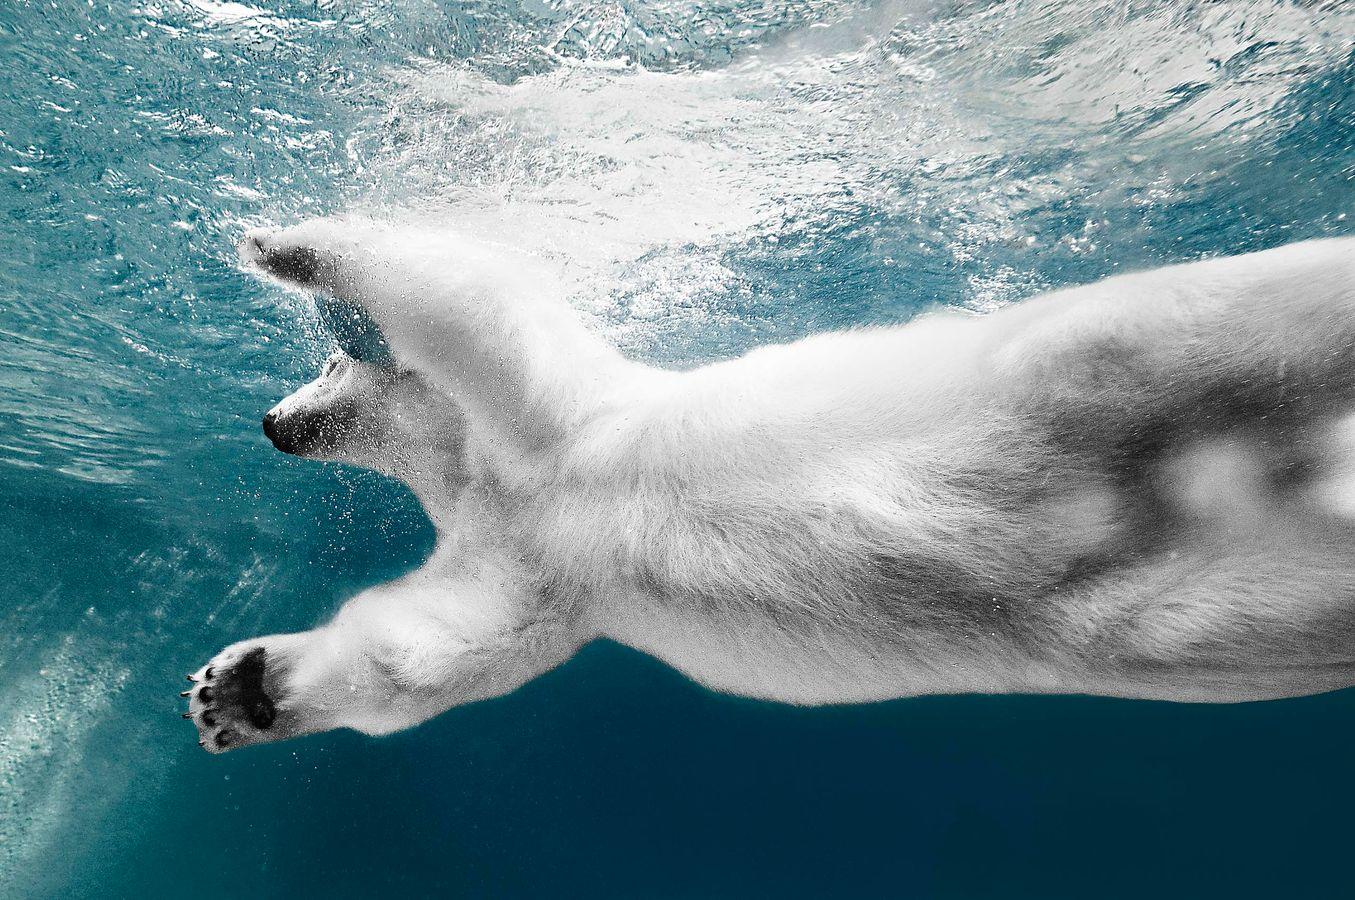 Coldilocks Floats Just Below the Water.jpg